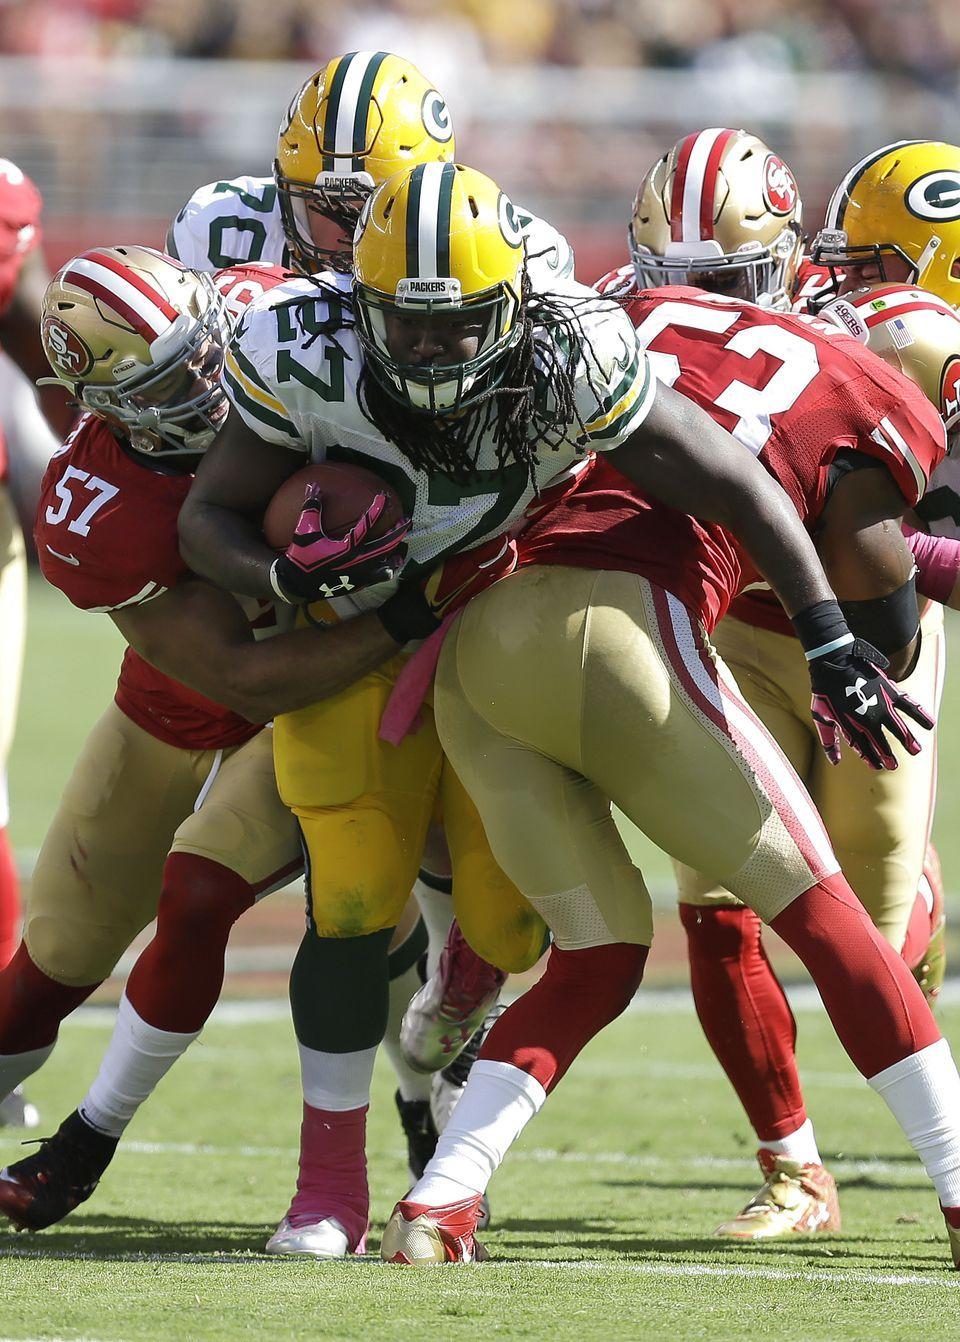 Green Bay Packers Running Back Eddie Lacy 27 Runs Between San Francisco 49ers Linebacker Michael Wilhoite 57 Nfl Football Games Navorro Bowman Nfl Football